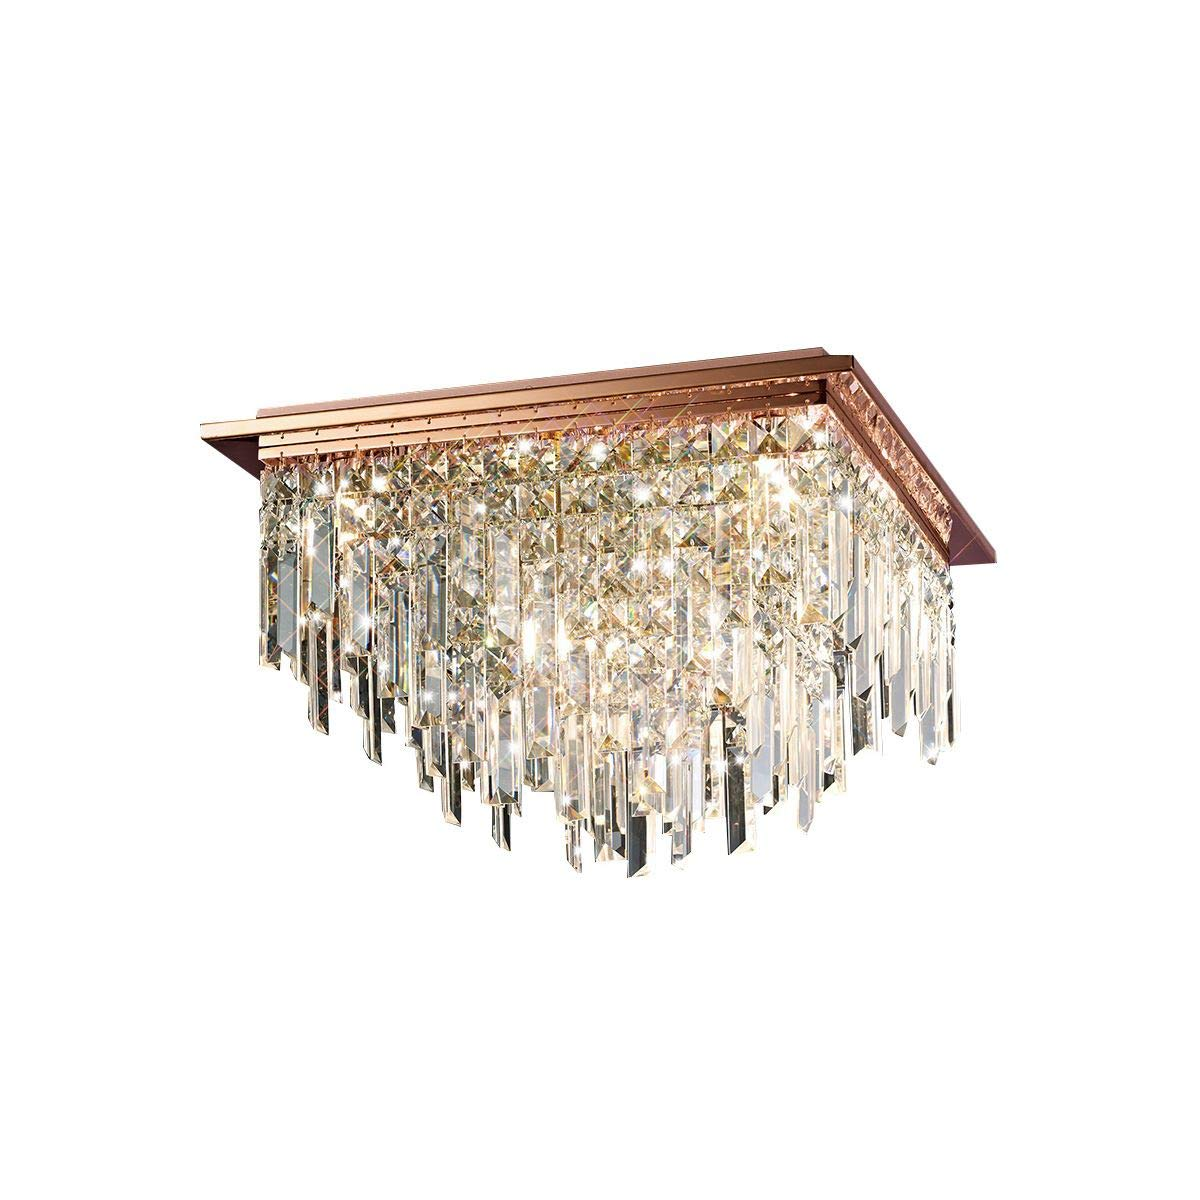 Diyas il31712 maddison ceiling square 6 light g9 rose gold crystal amazon co uk lighting